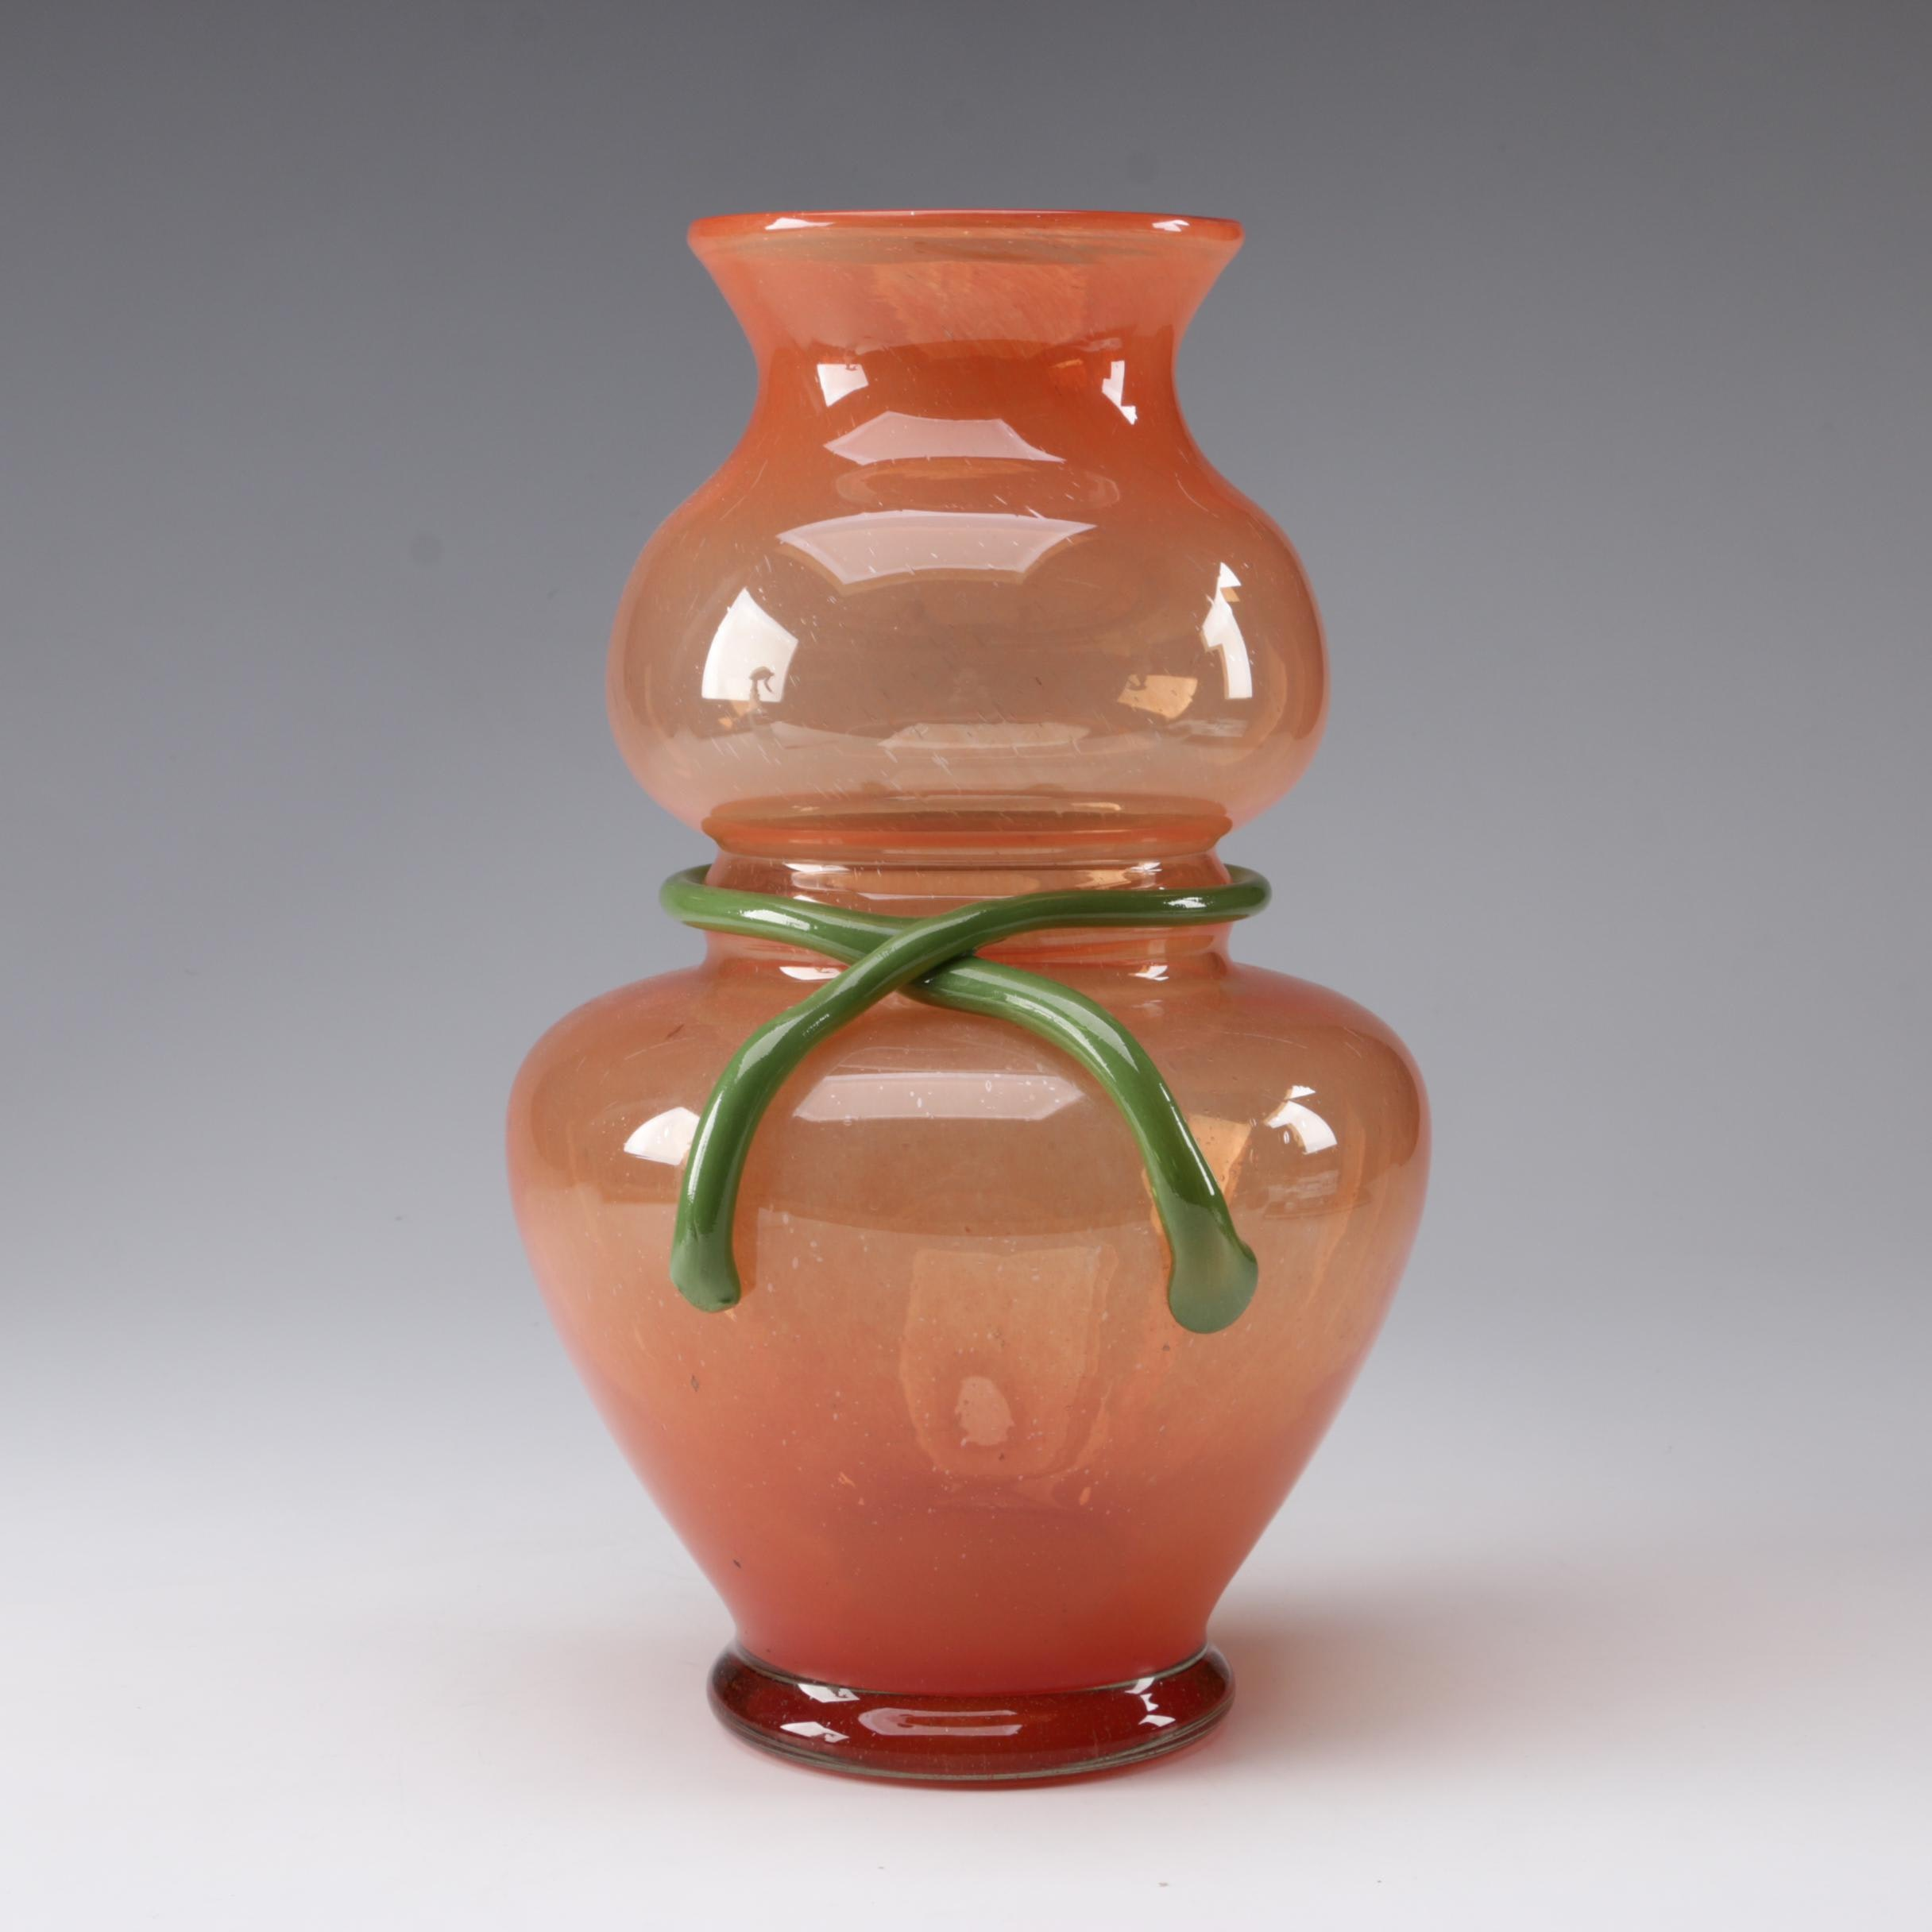 Romanian Hand Blown Orange and Green Art Glass Gourd Vase